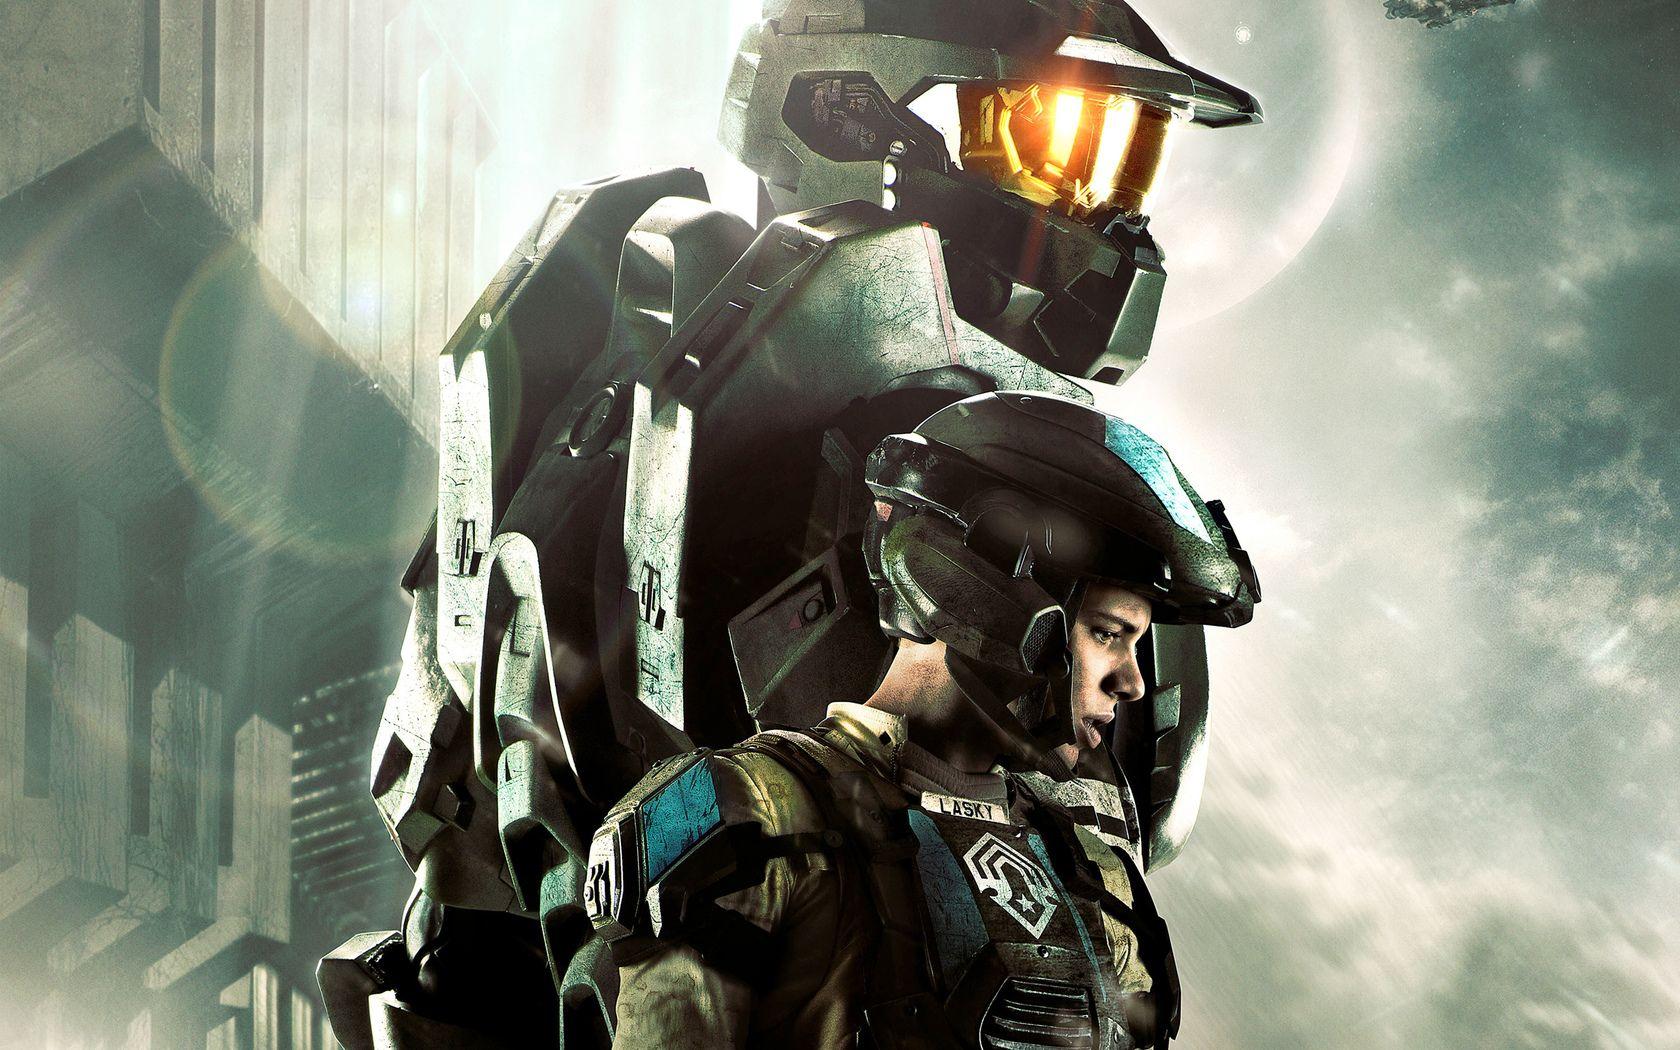 Tv Show Halo 4 Forward Unto Dawn Master Chief Lasky Wallpaper